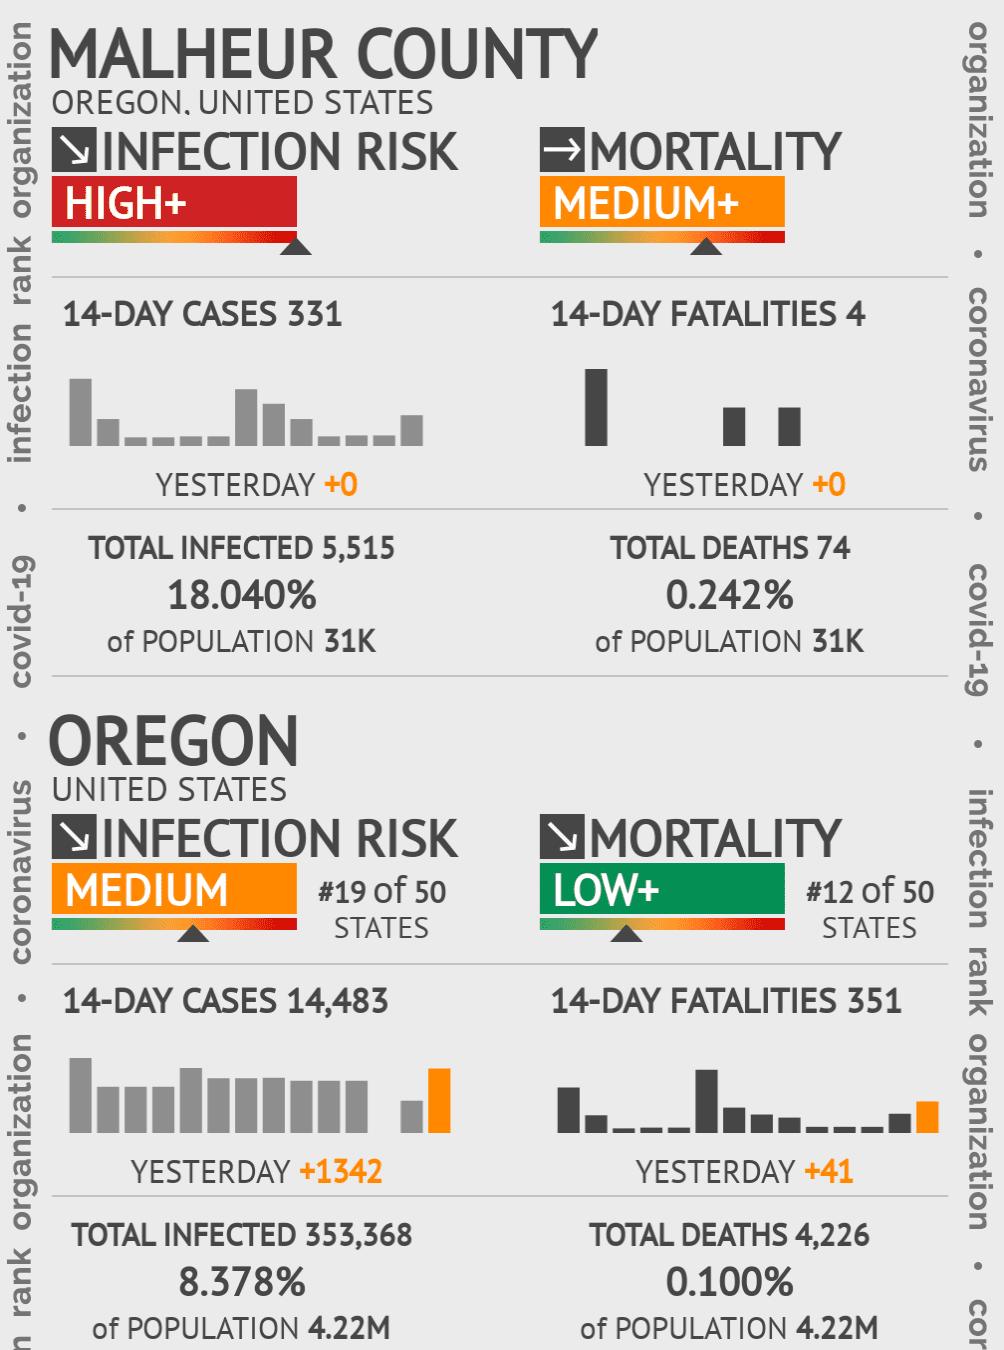 Malheur County Coronavirus Covid-19 Risk of Infection on February 23, 2021